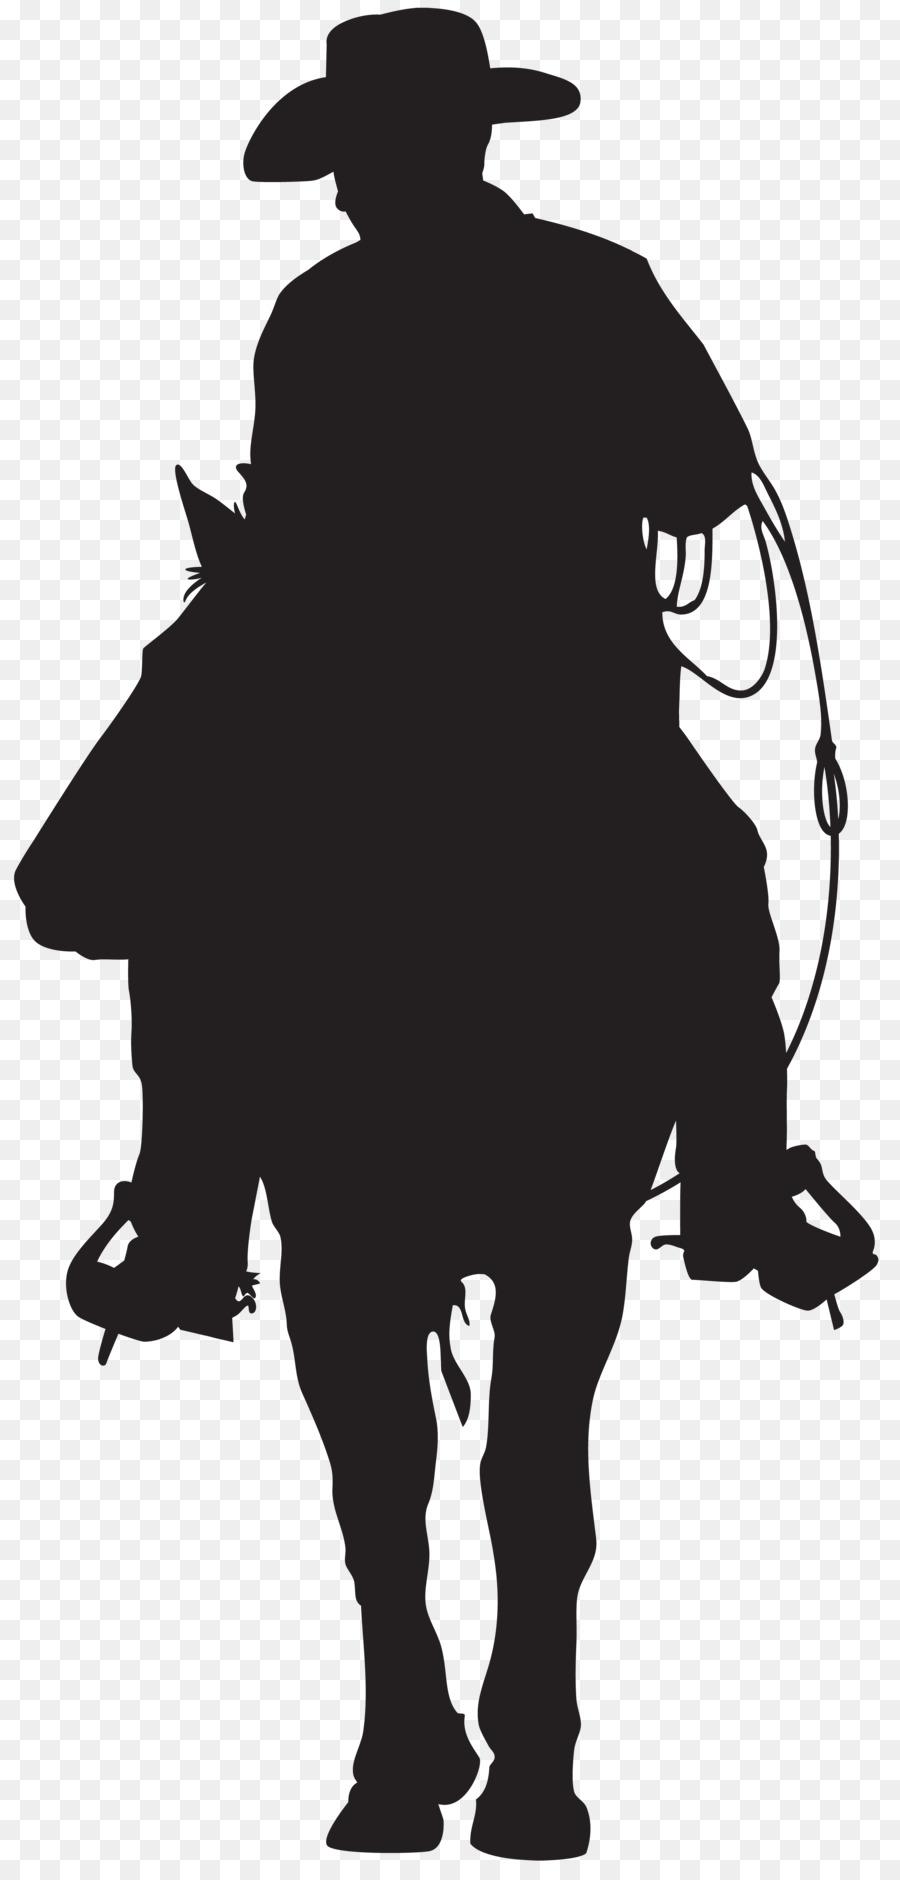 american frontier cowboy silhouette clip art cowboy png download rh kisspng com cowboy boot silhouette clip art cowboy hat silhouette clip art